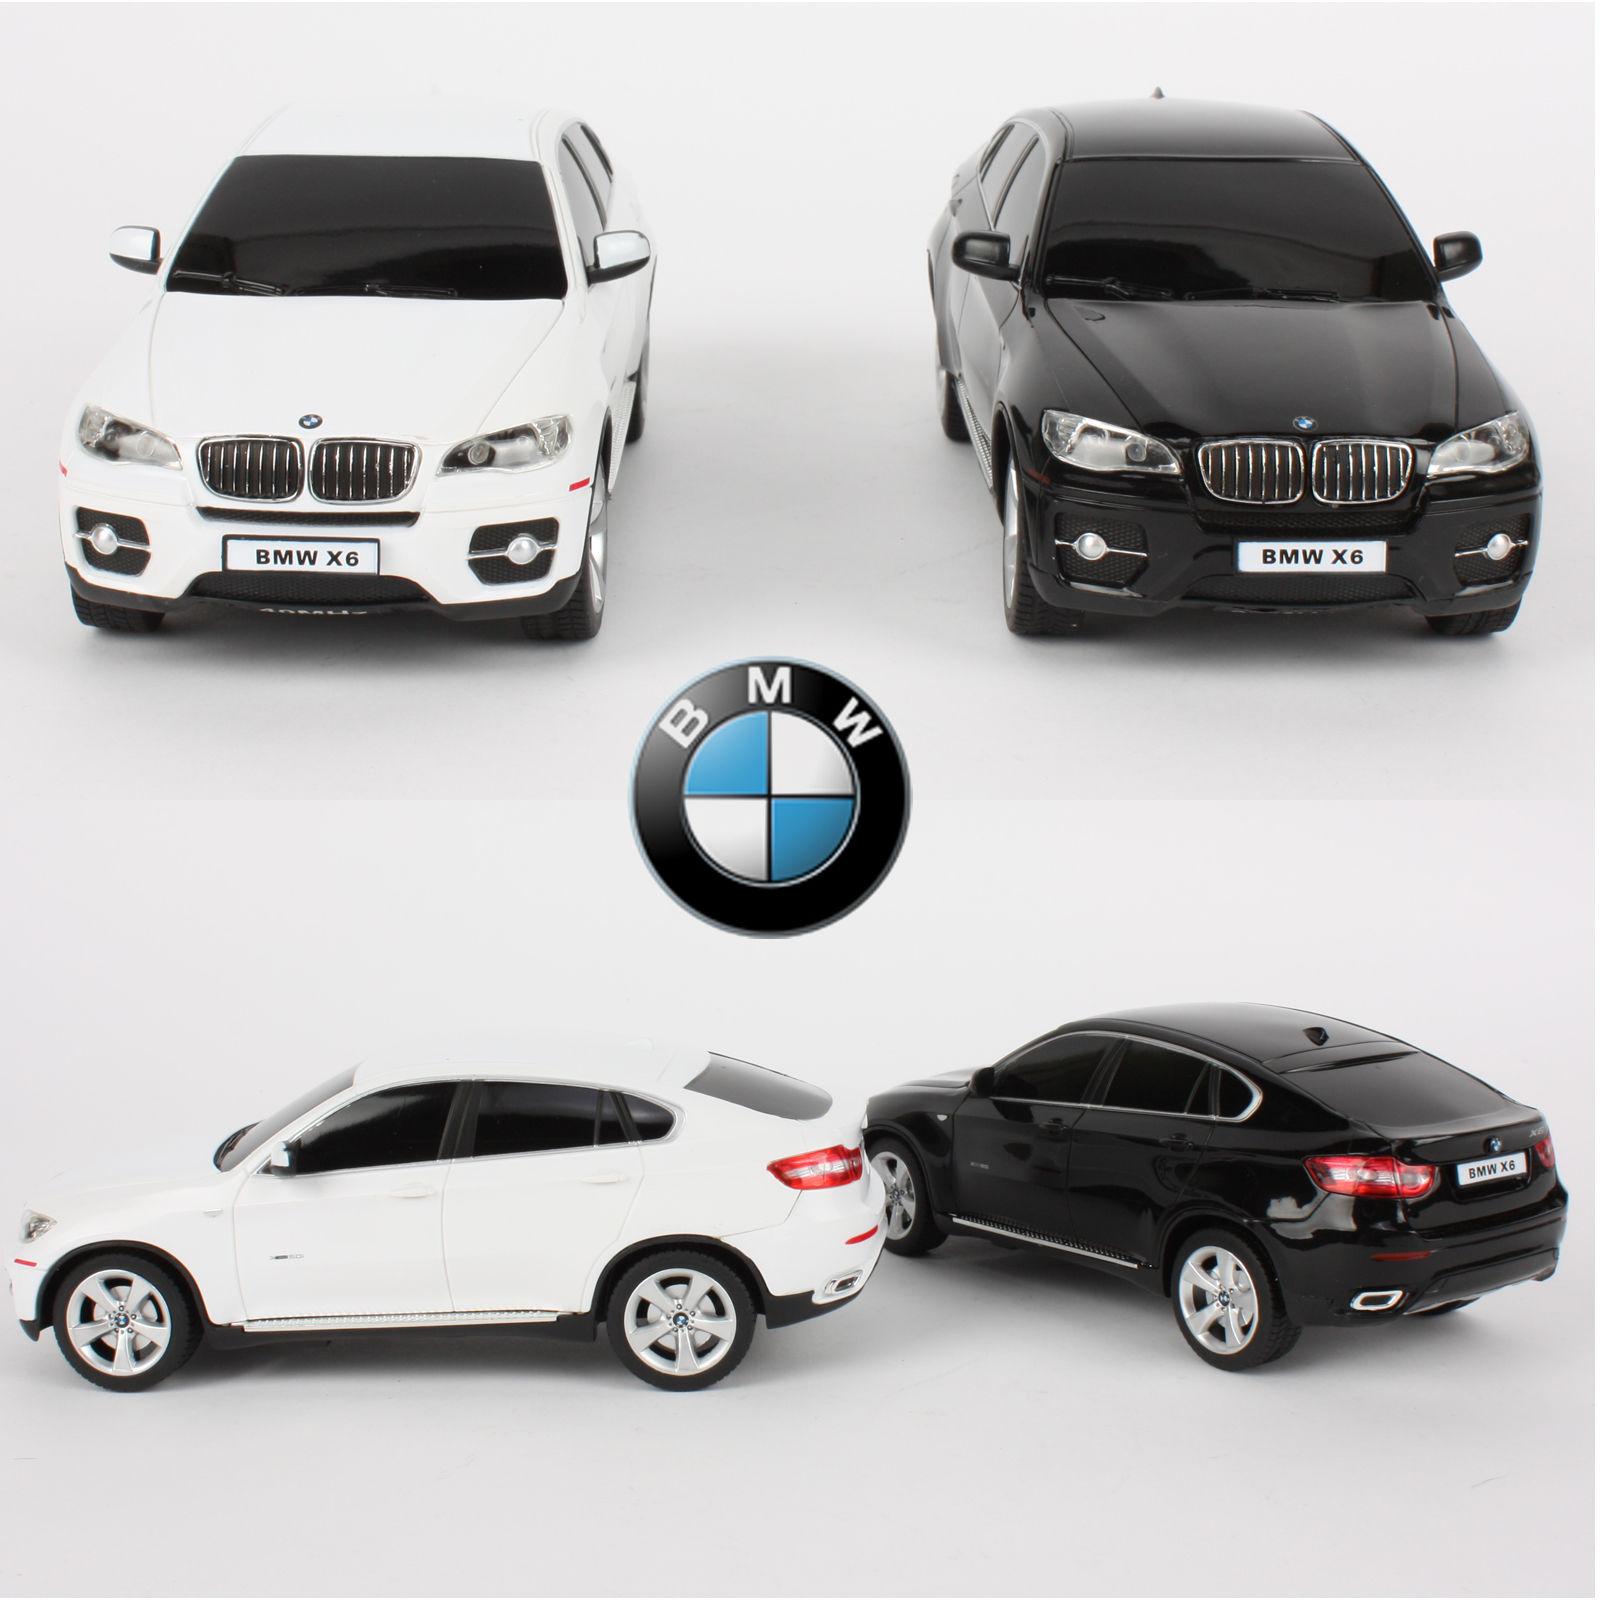 Bmw X6 Toy Car: BMW X6 Radio Controlled Car Official Licensed RC Cars(ON